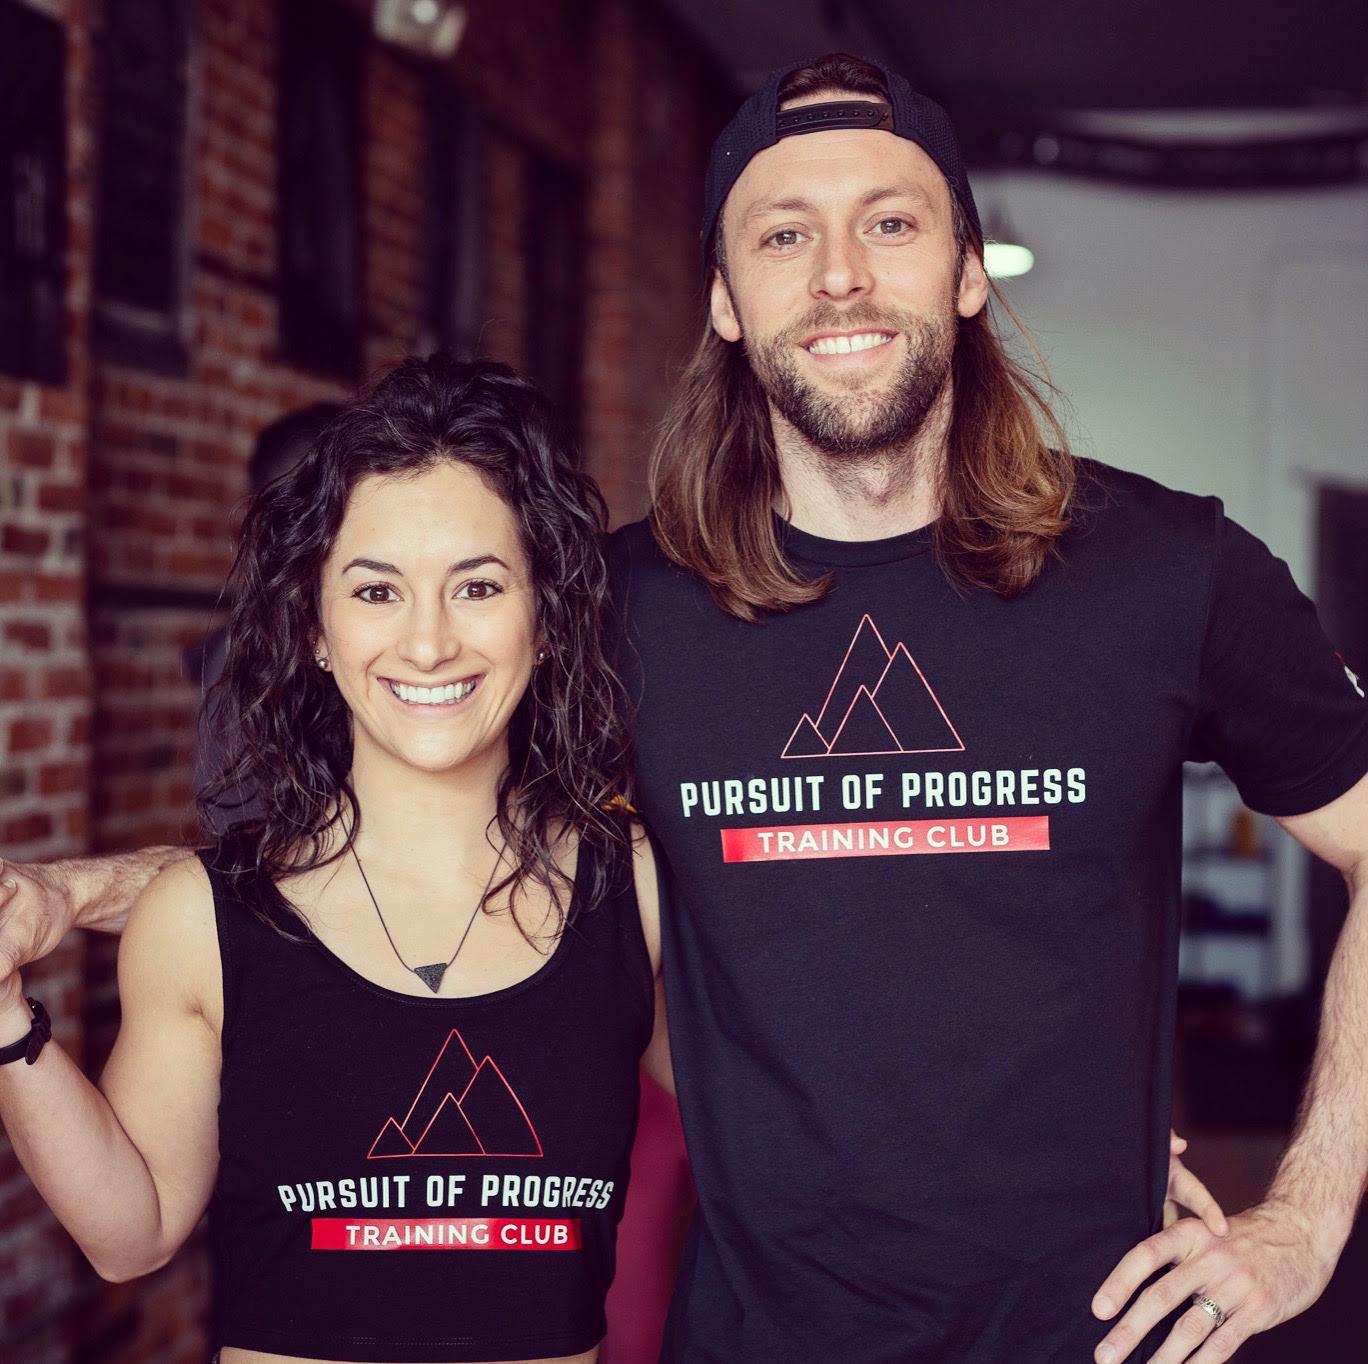 Pursuit of Progress Training Club